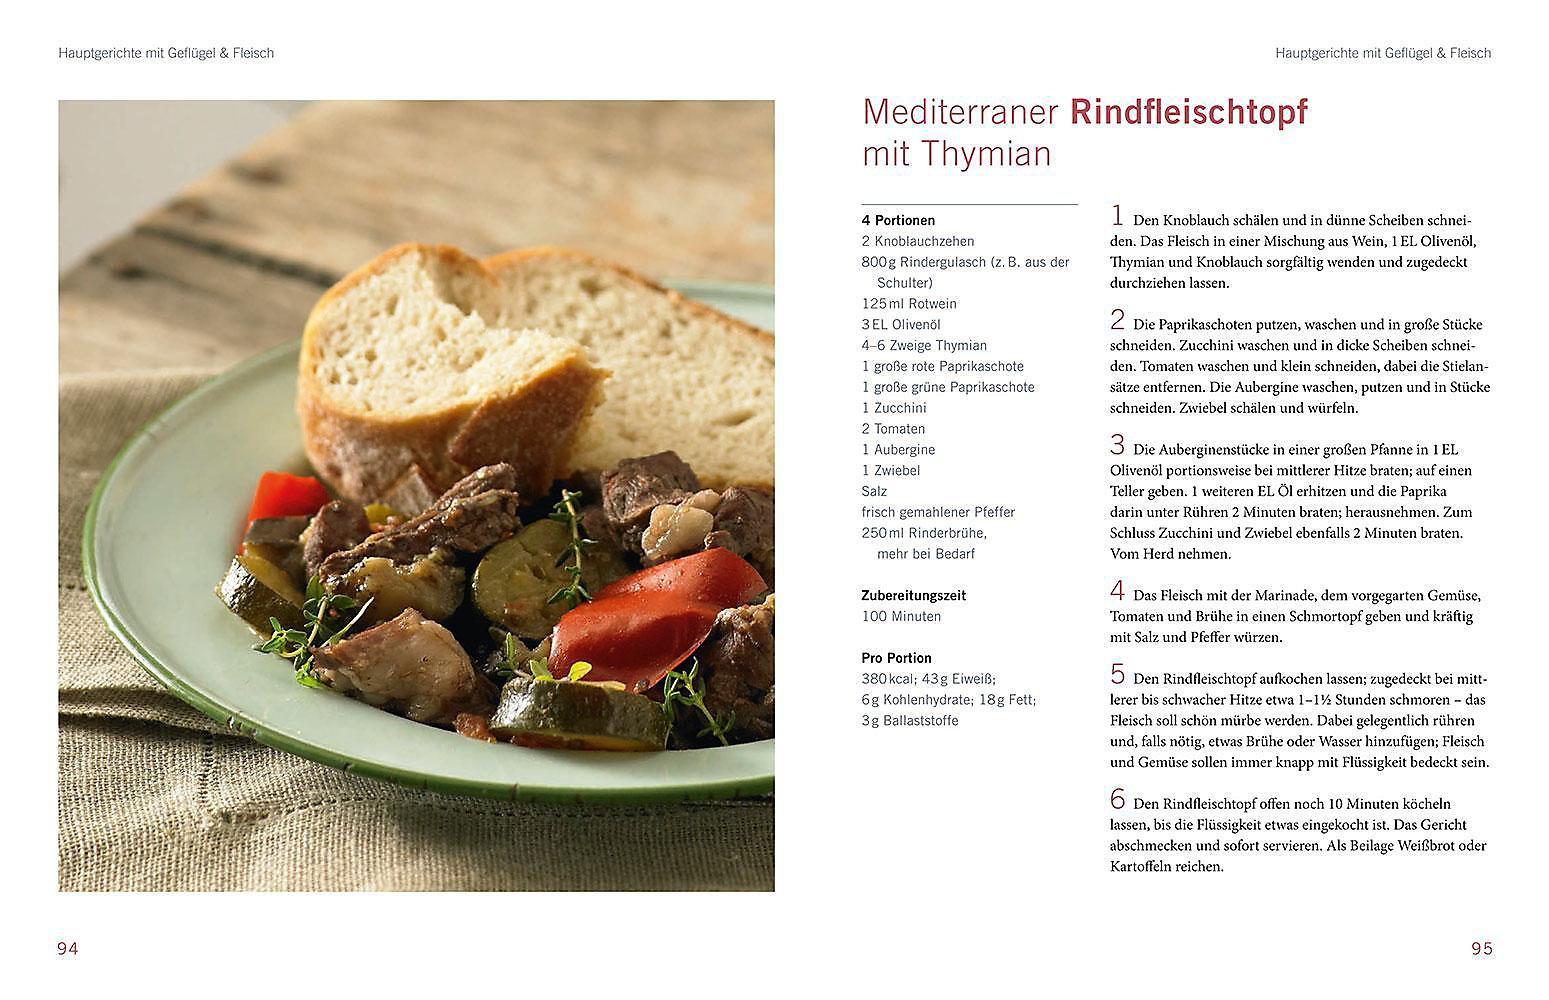 Rezepte Leichte Sommerküche Kalorienarm : Lecker leichte 500 kalorien rezepte buch portofrei weltbild.de